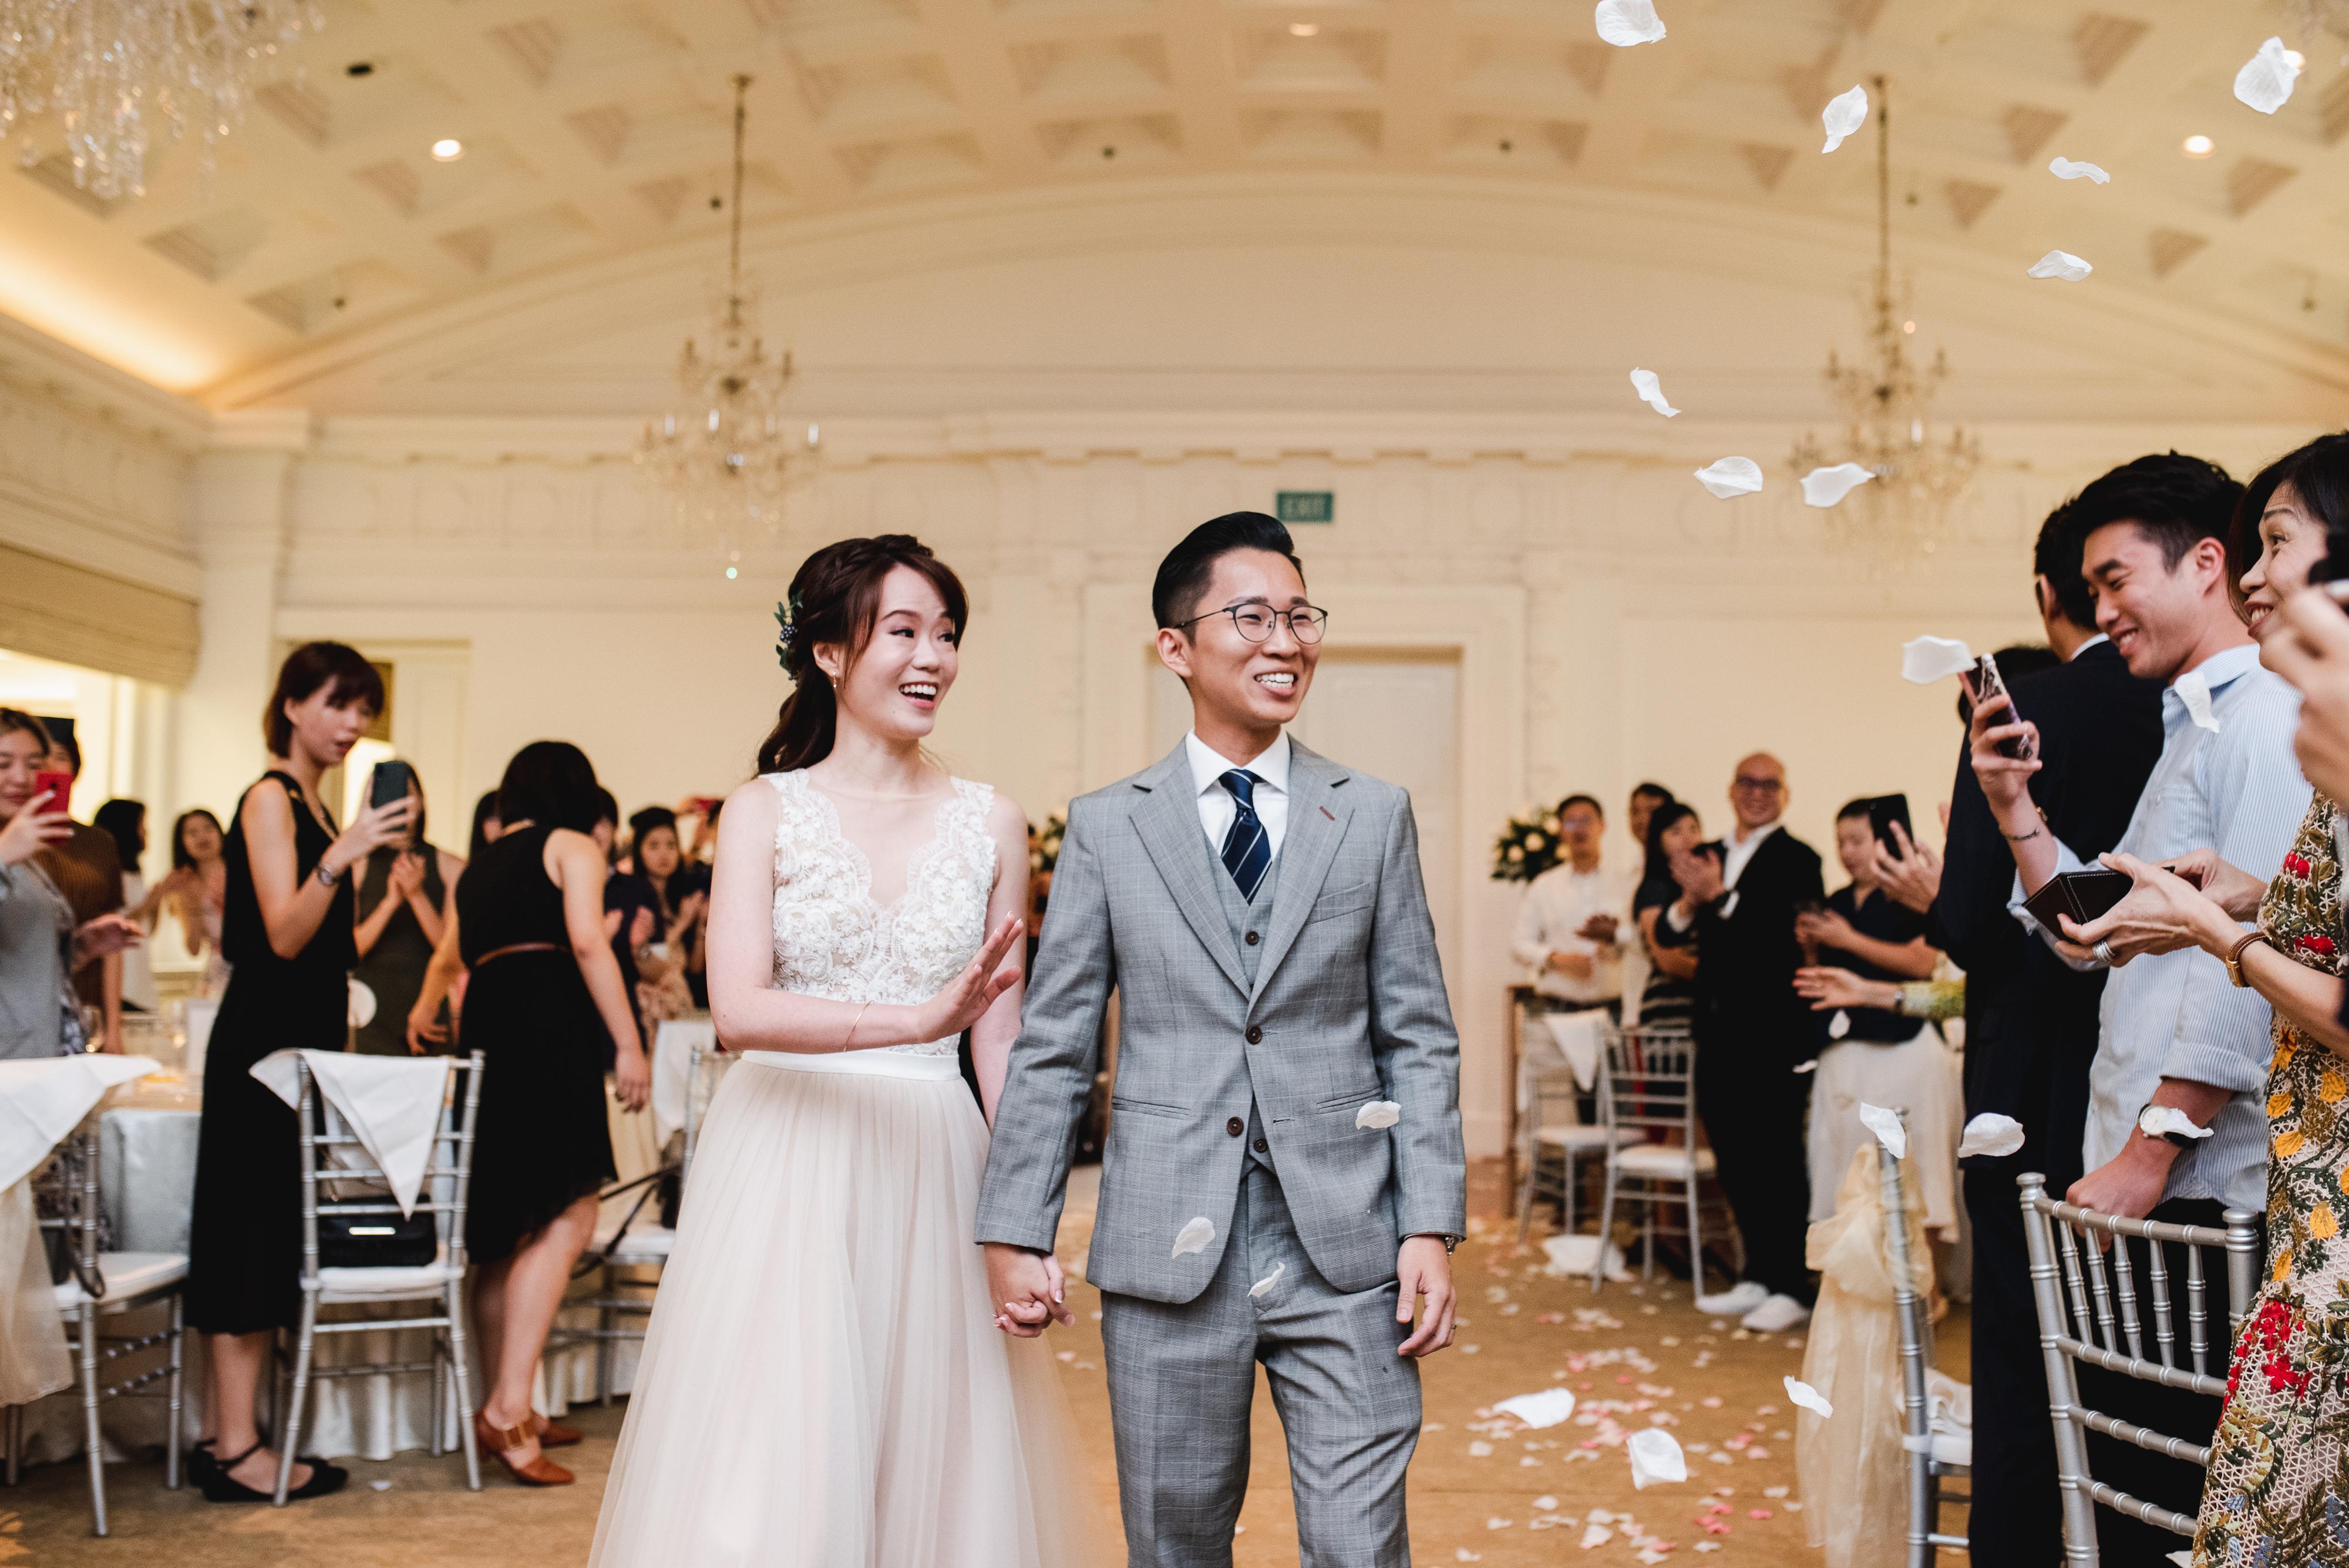 Kai Sun & Wen Jing - 469